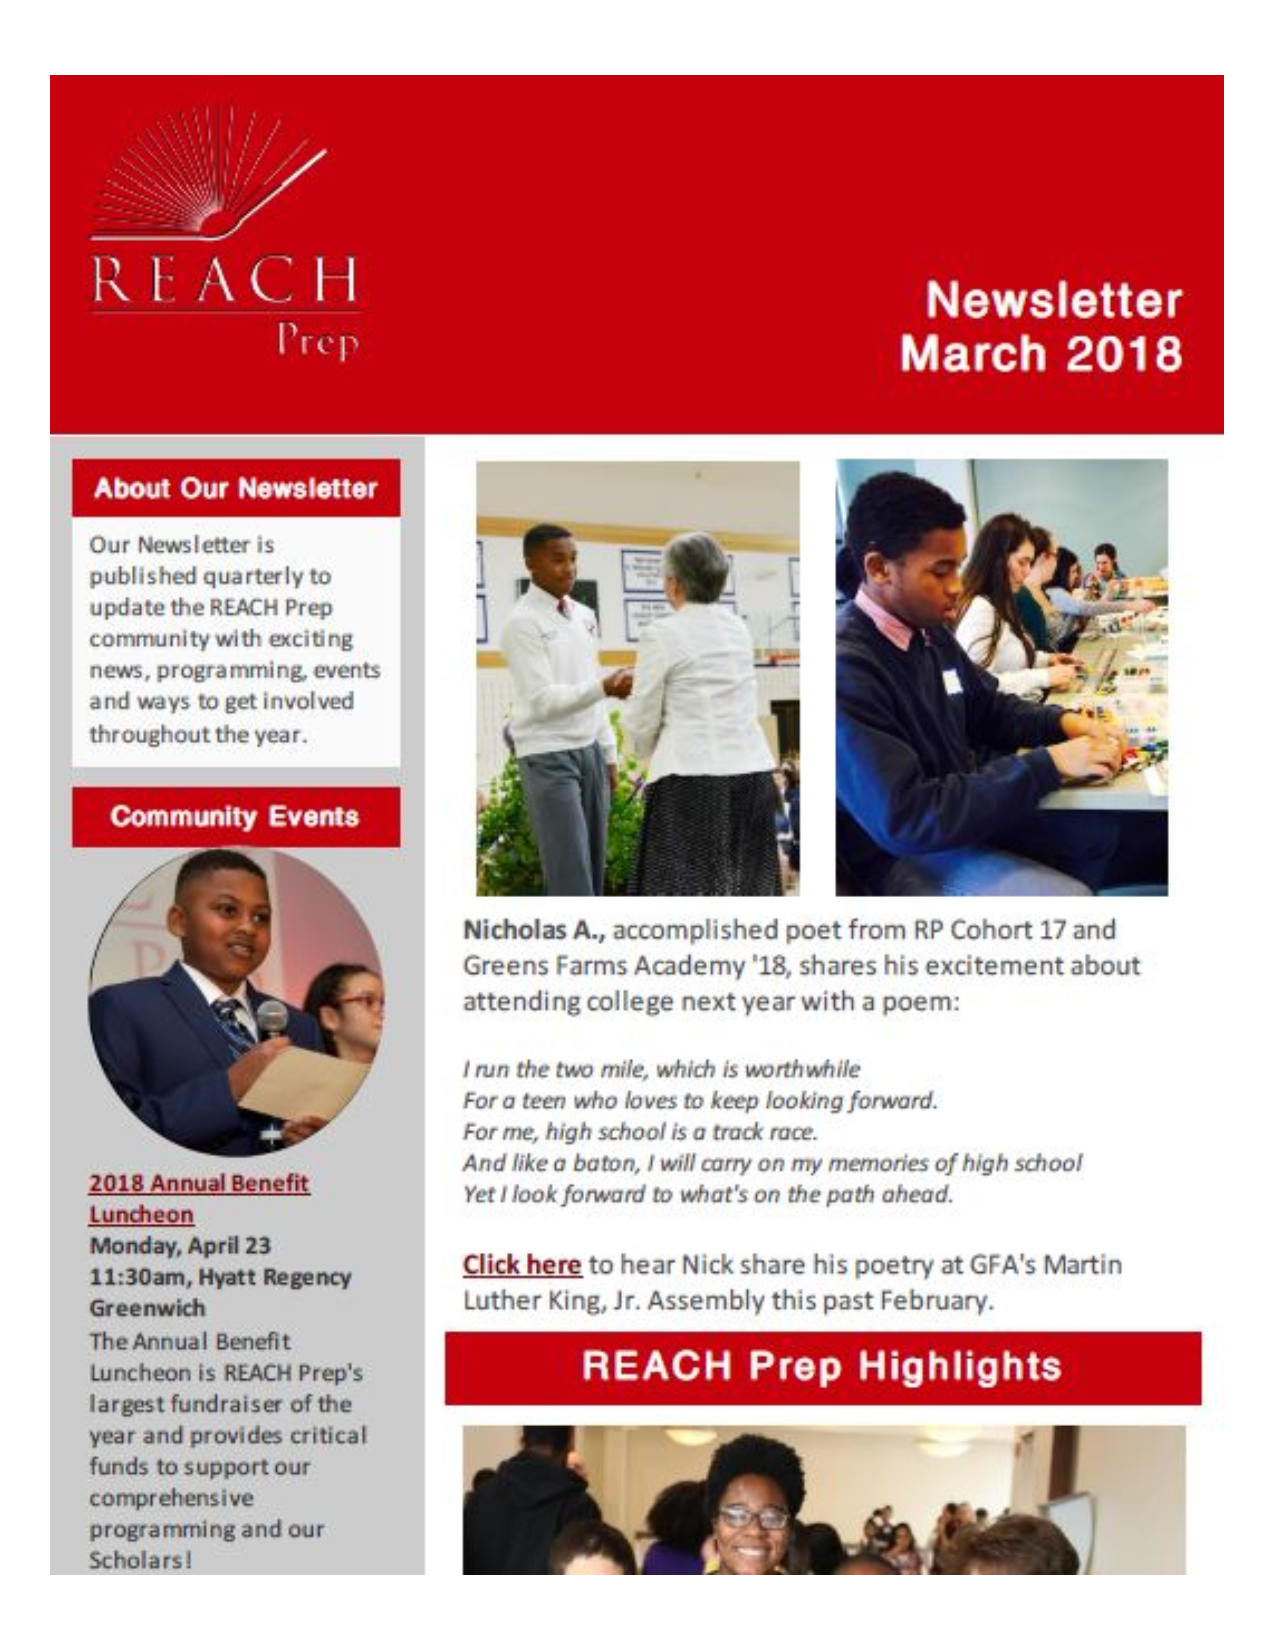 Newsletter: March 2018